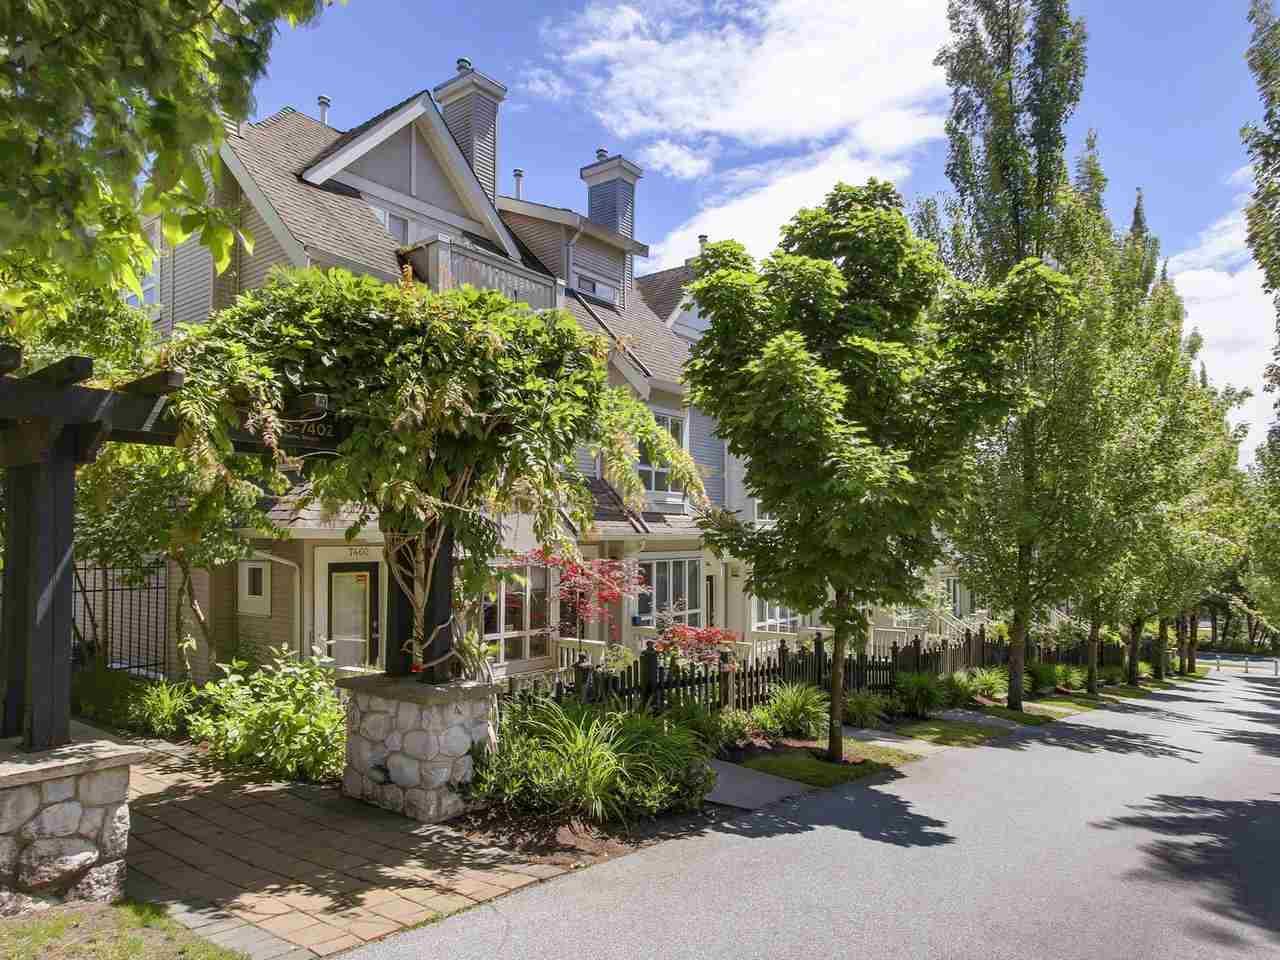 Sold: 7432 Hawthorne Terrace, Burnaby, BC